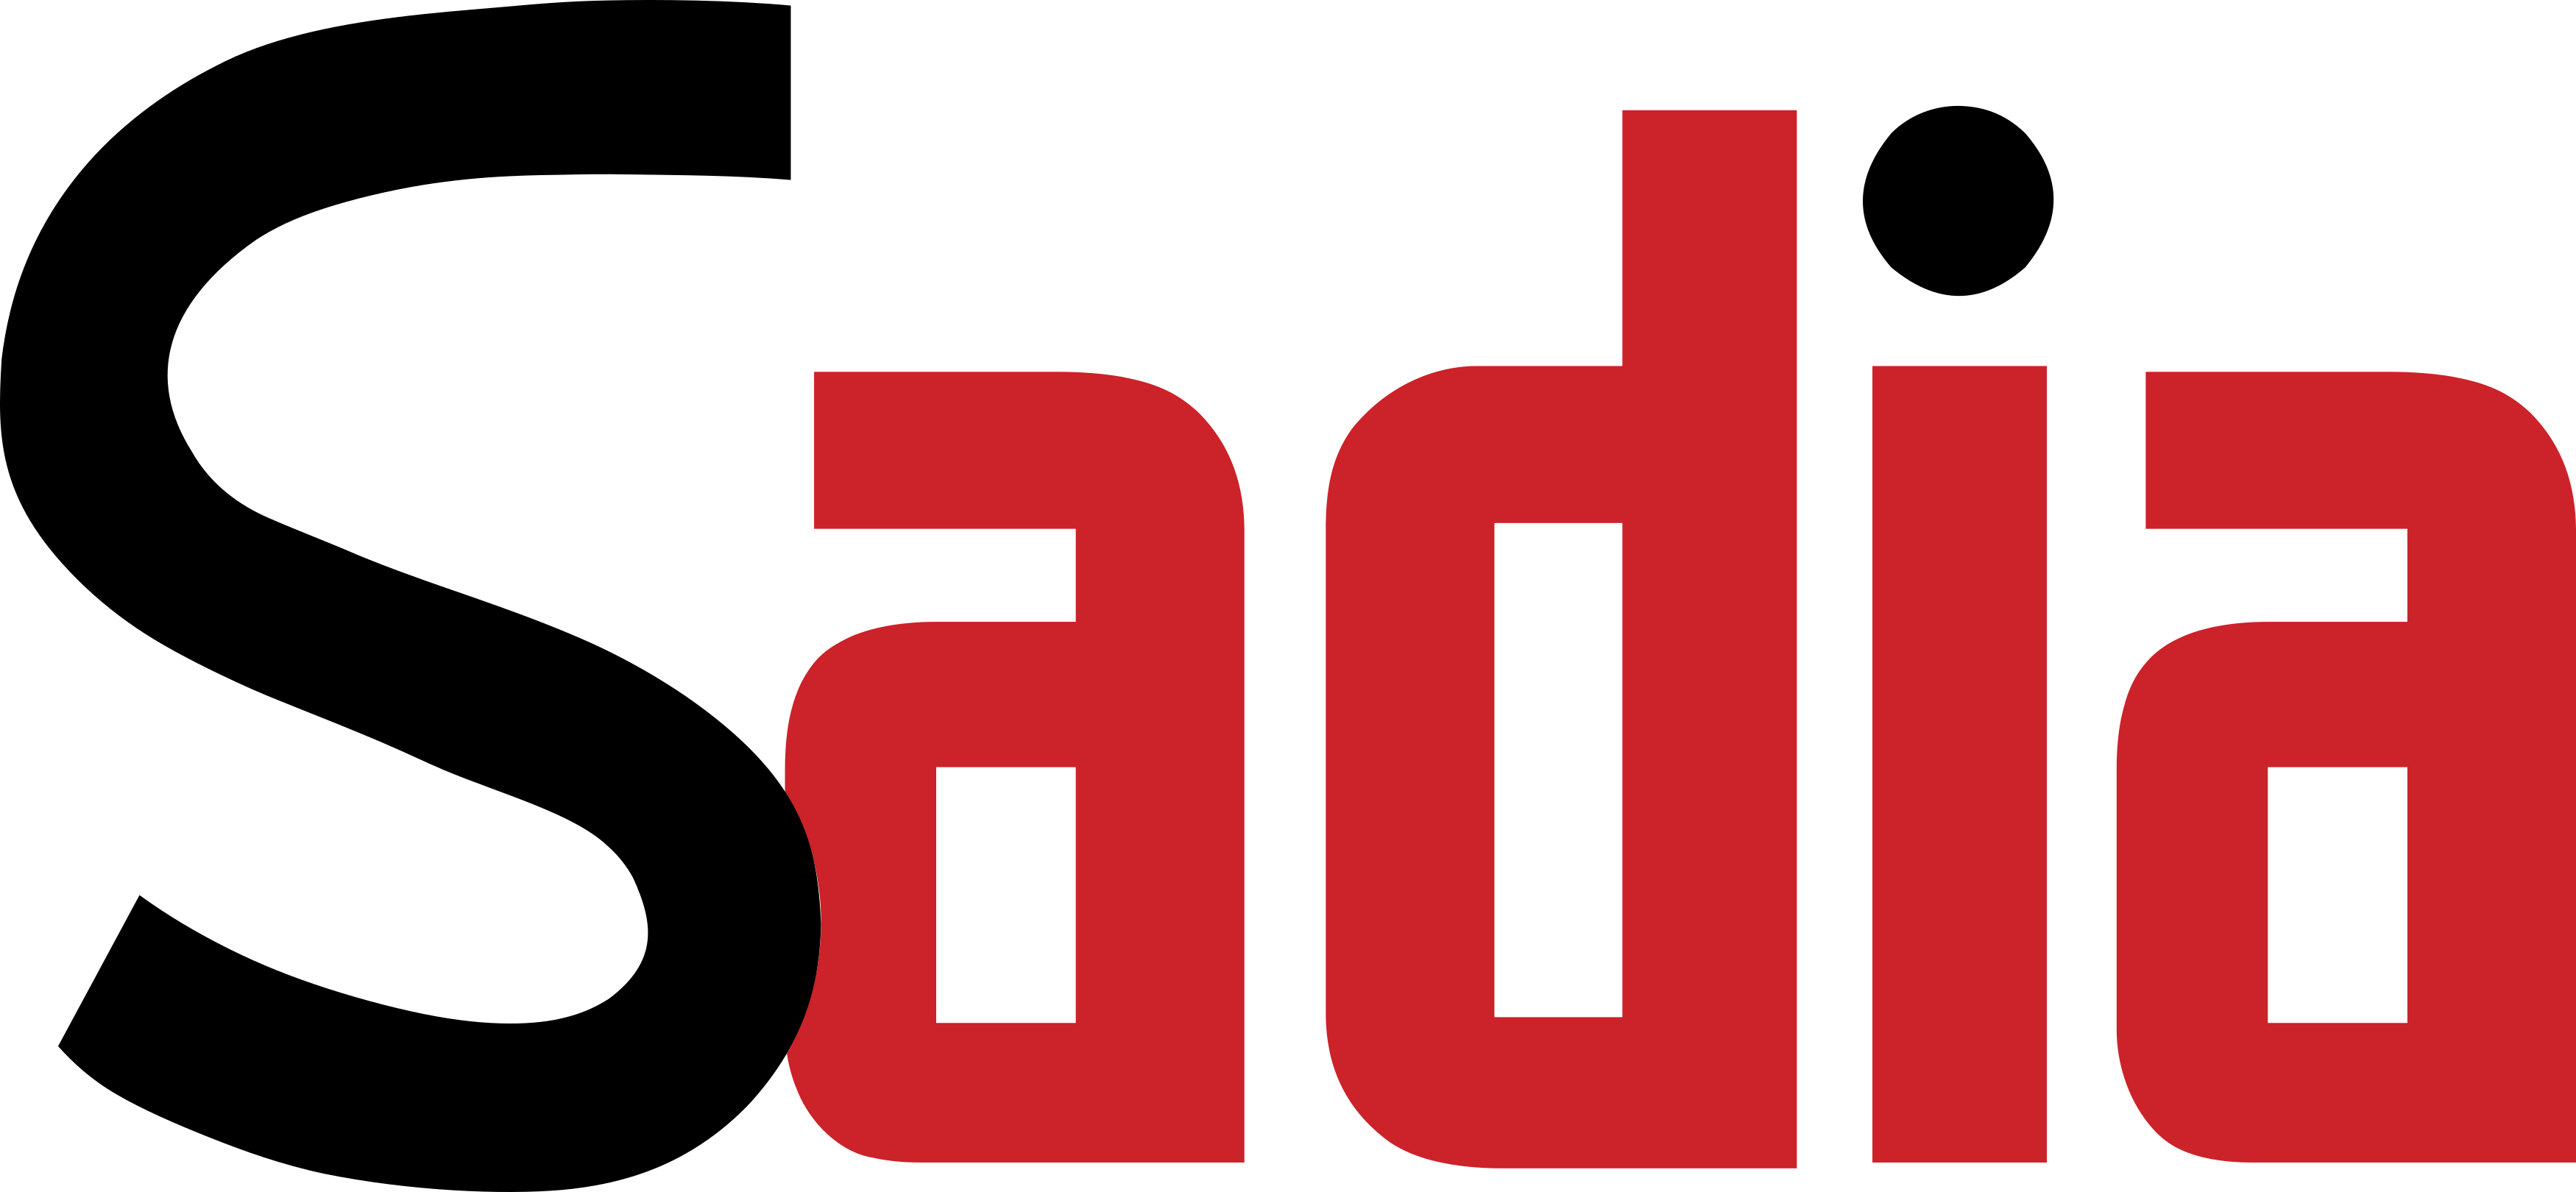 sadia logo 1 - Sadia Logo